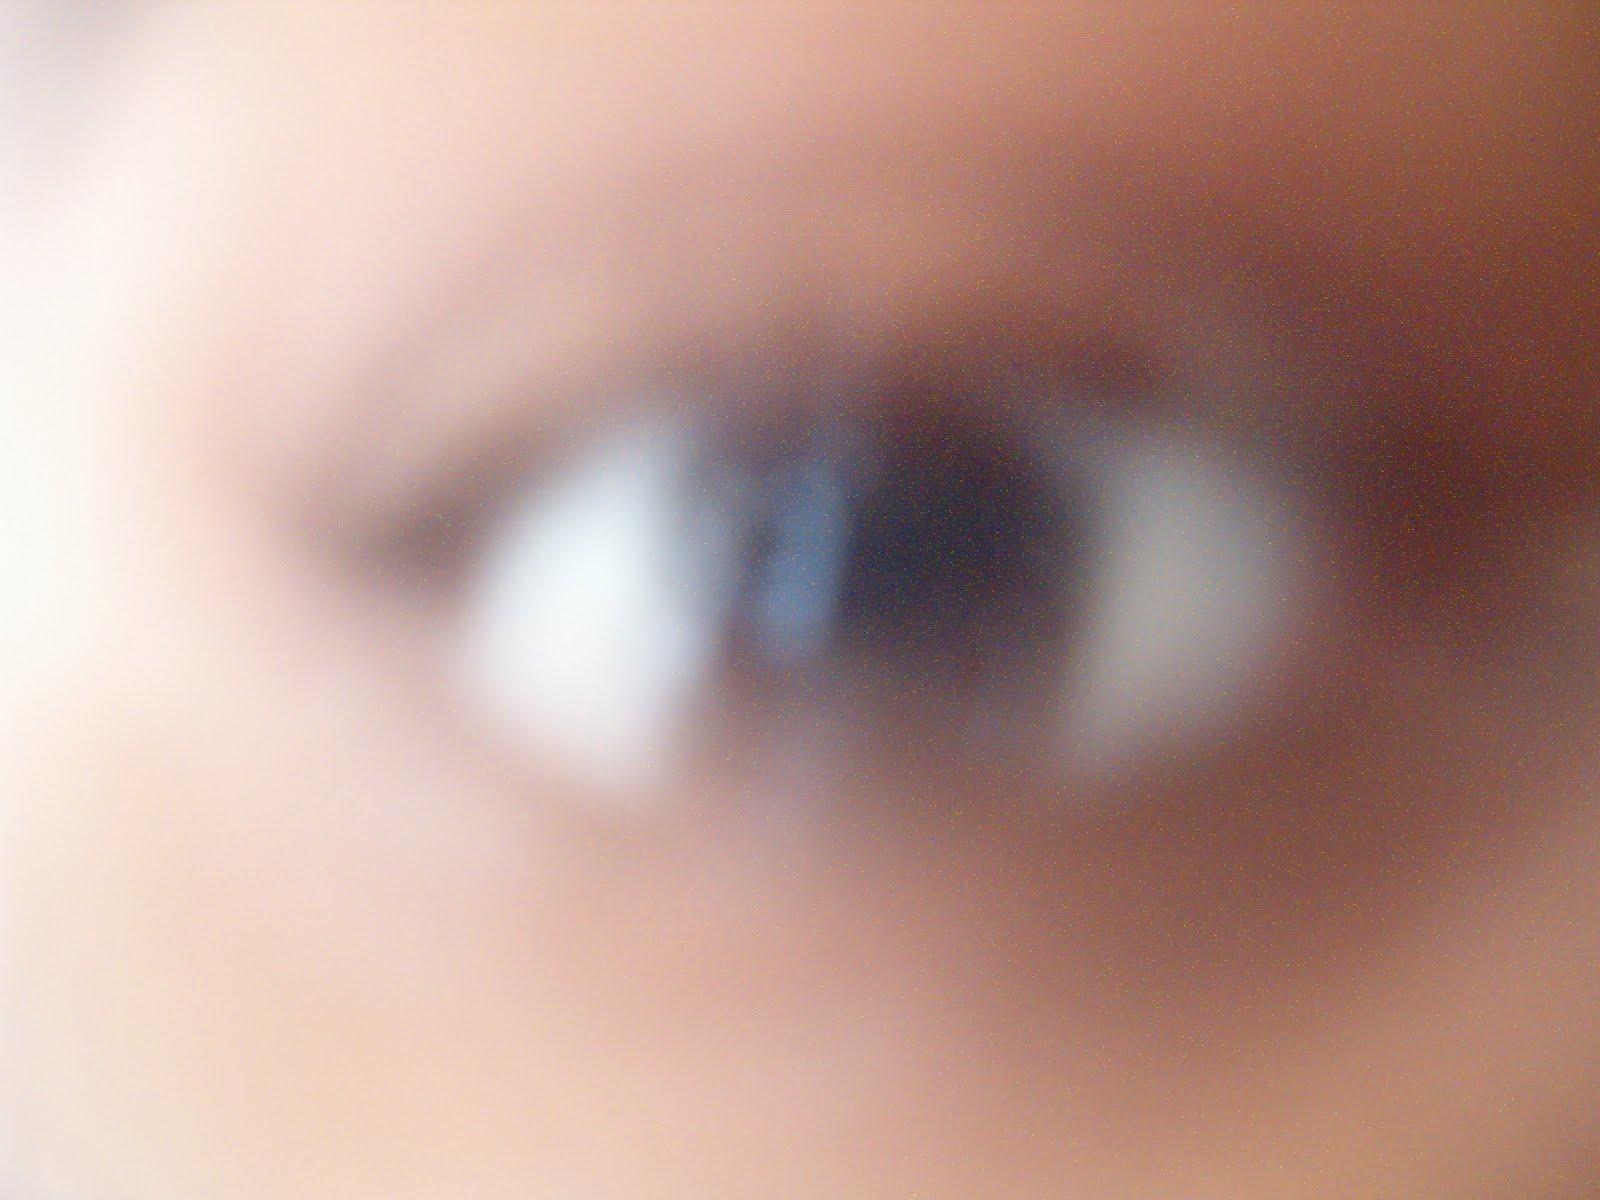 blurred+vision.jpg